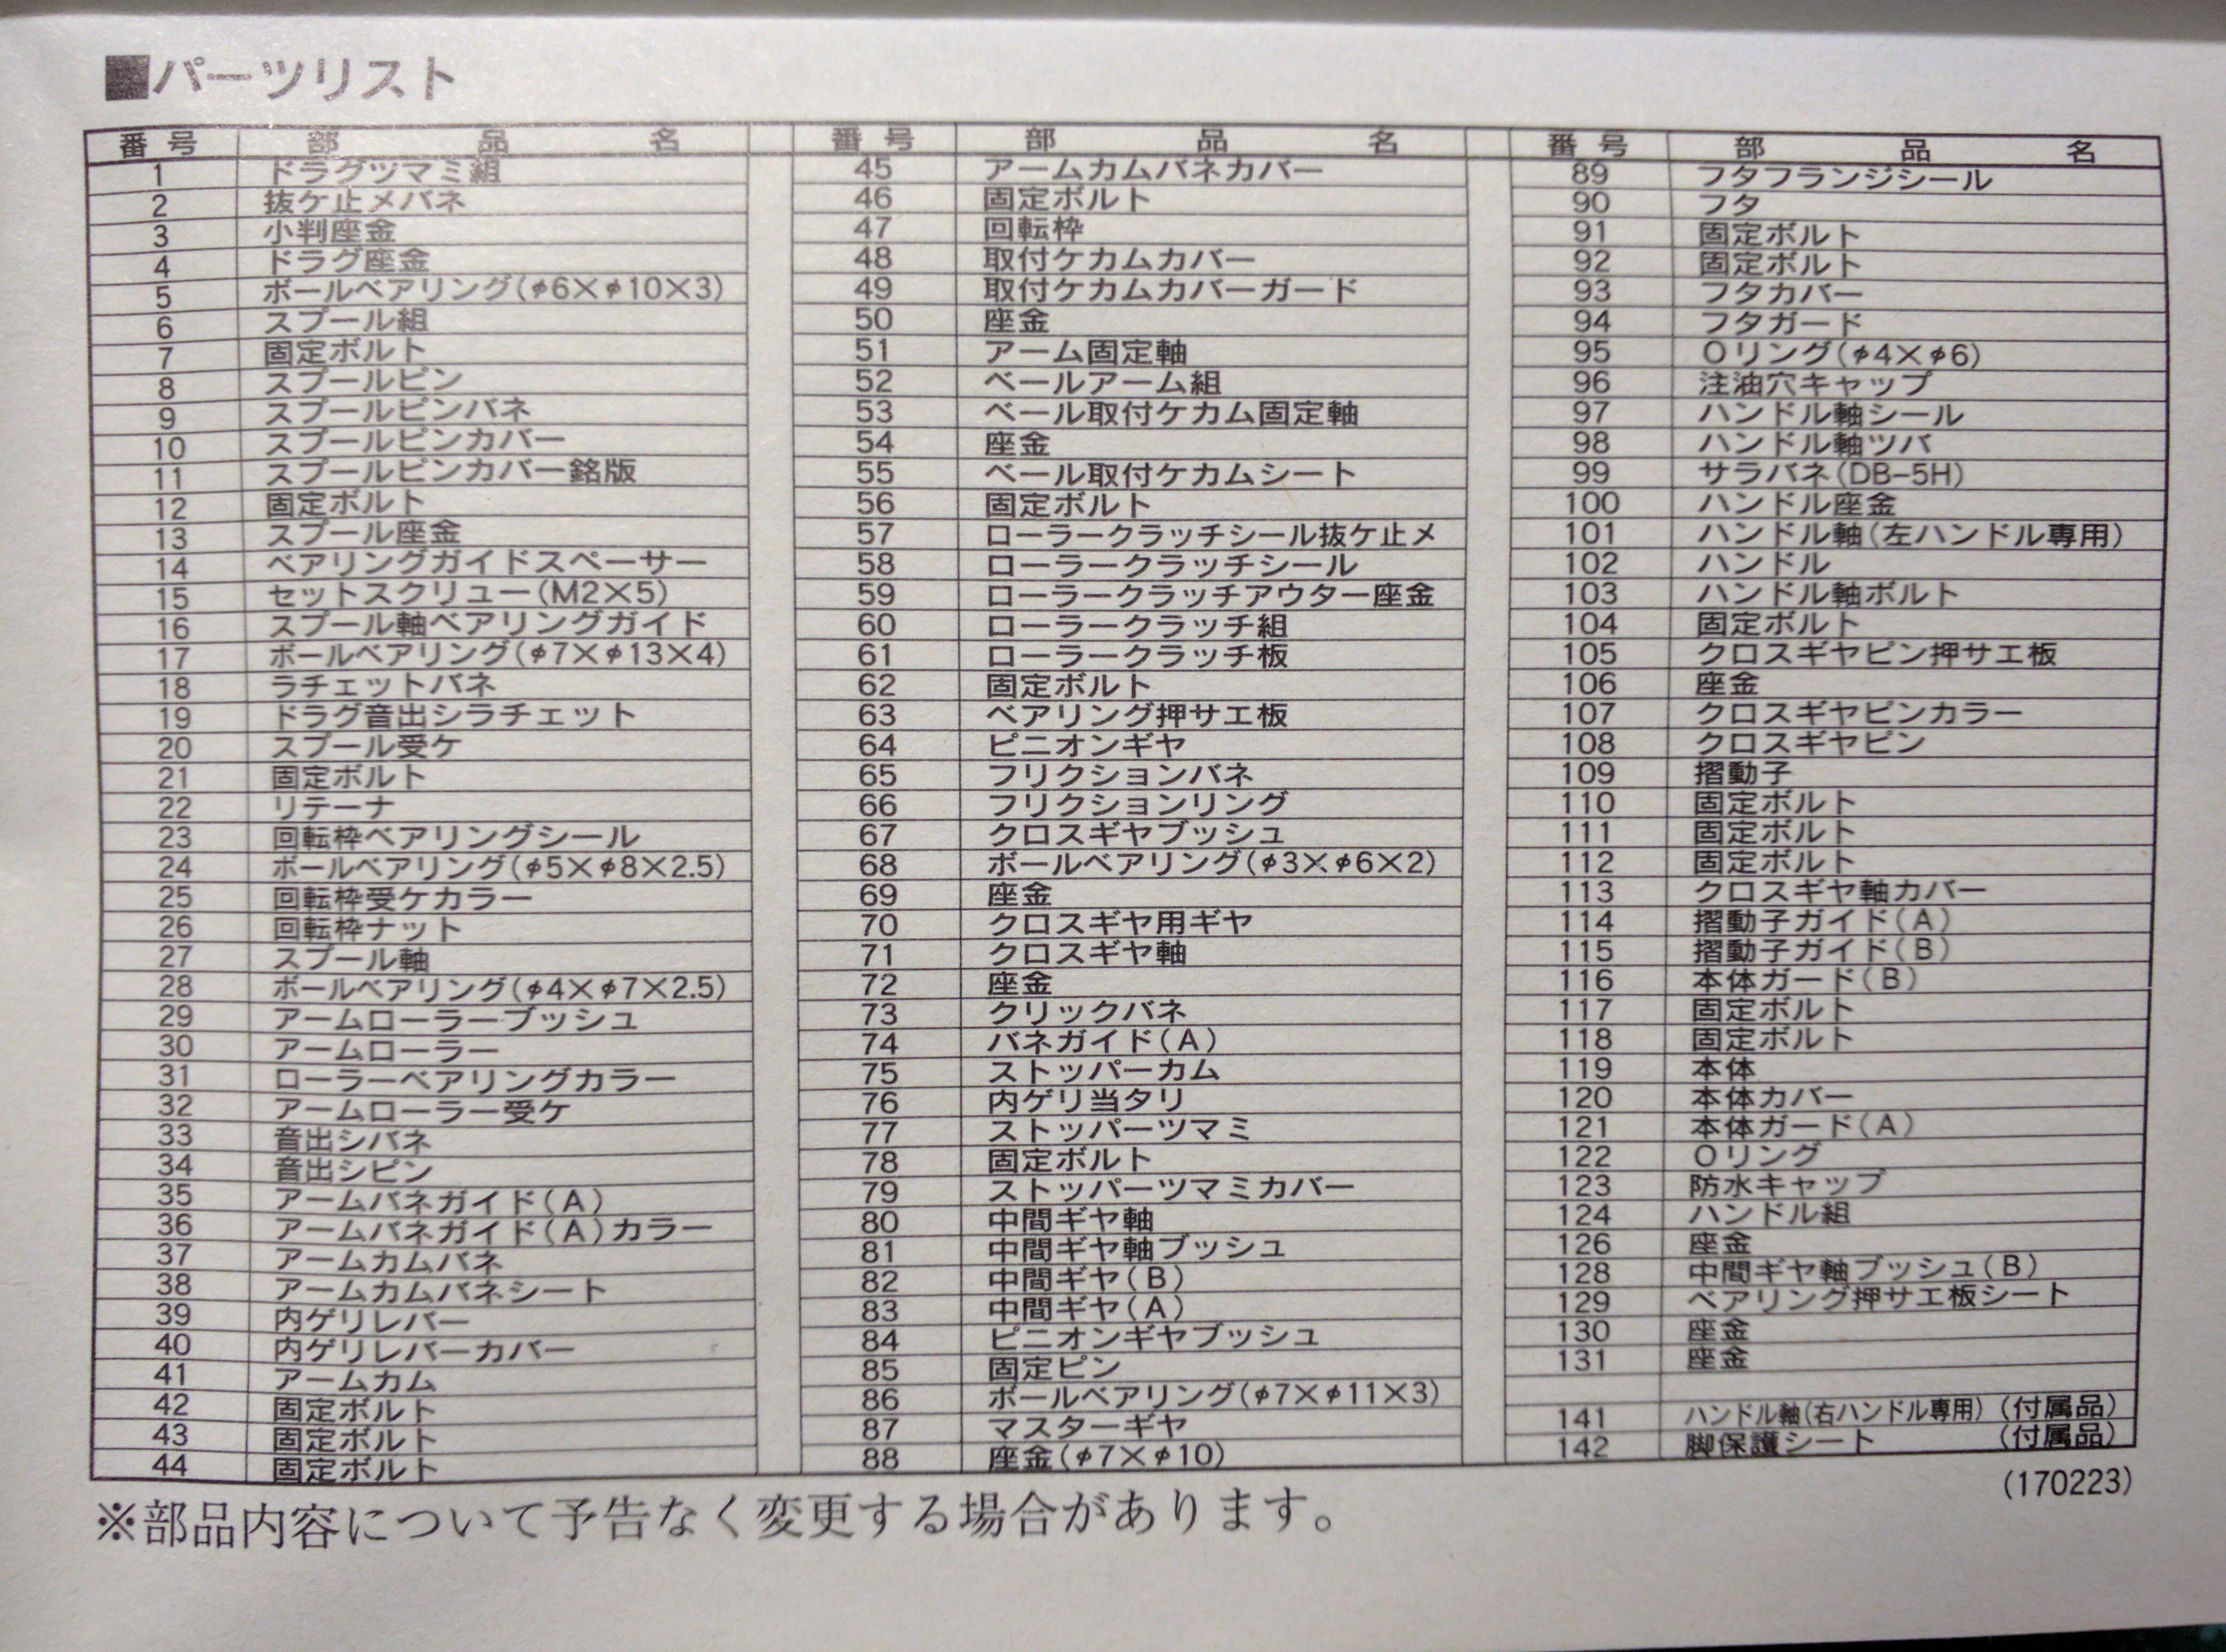 shimano-04stella-2500-parts-list (107223)